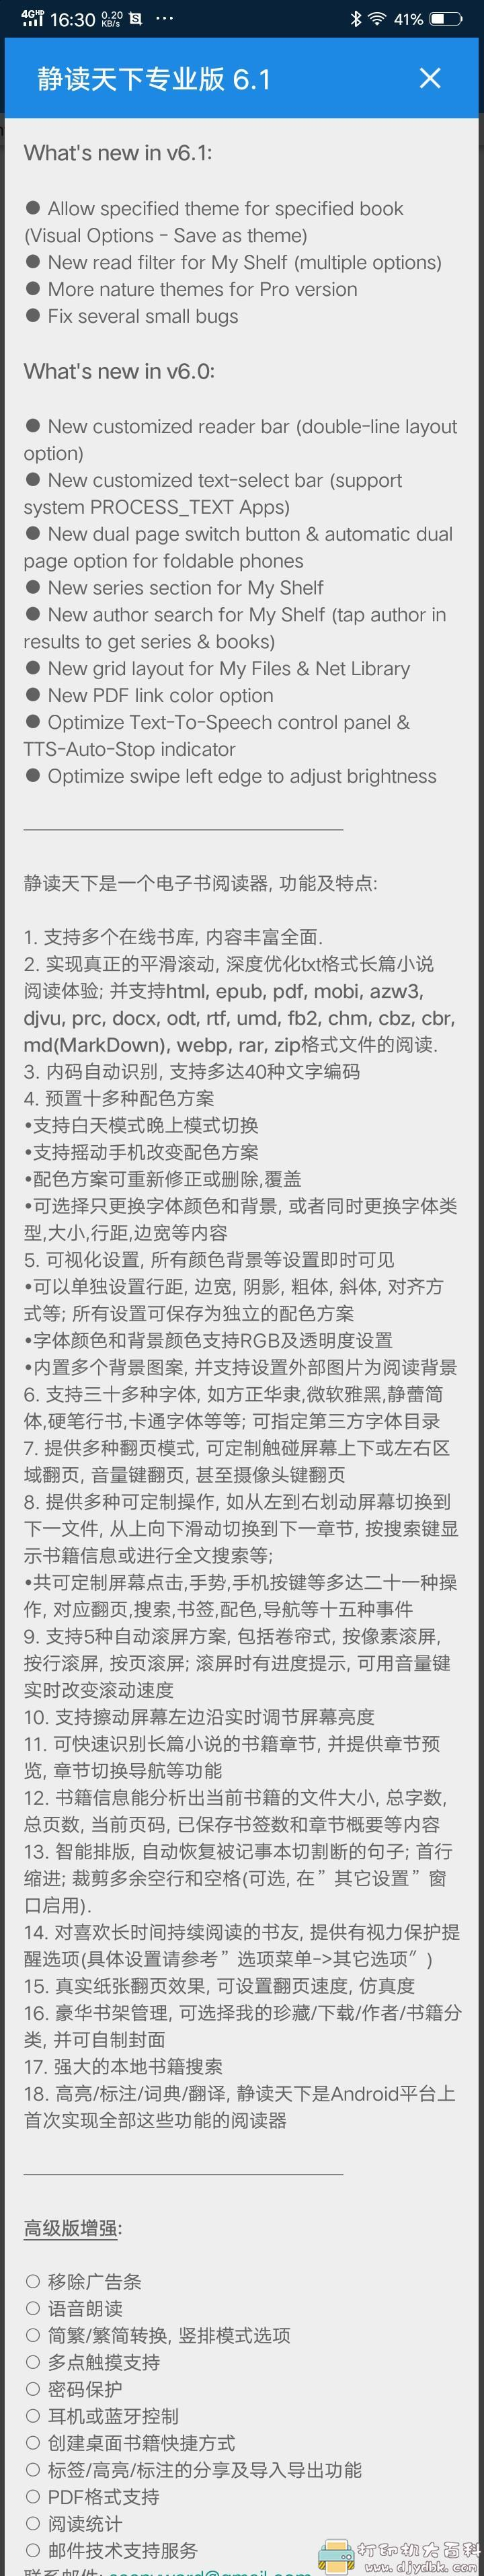 [Android]静读天下 v6.1 Pro 专业正式版 配图